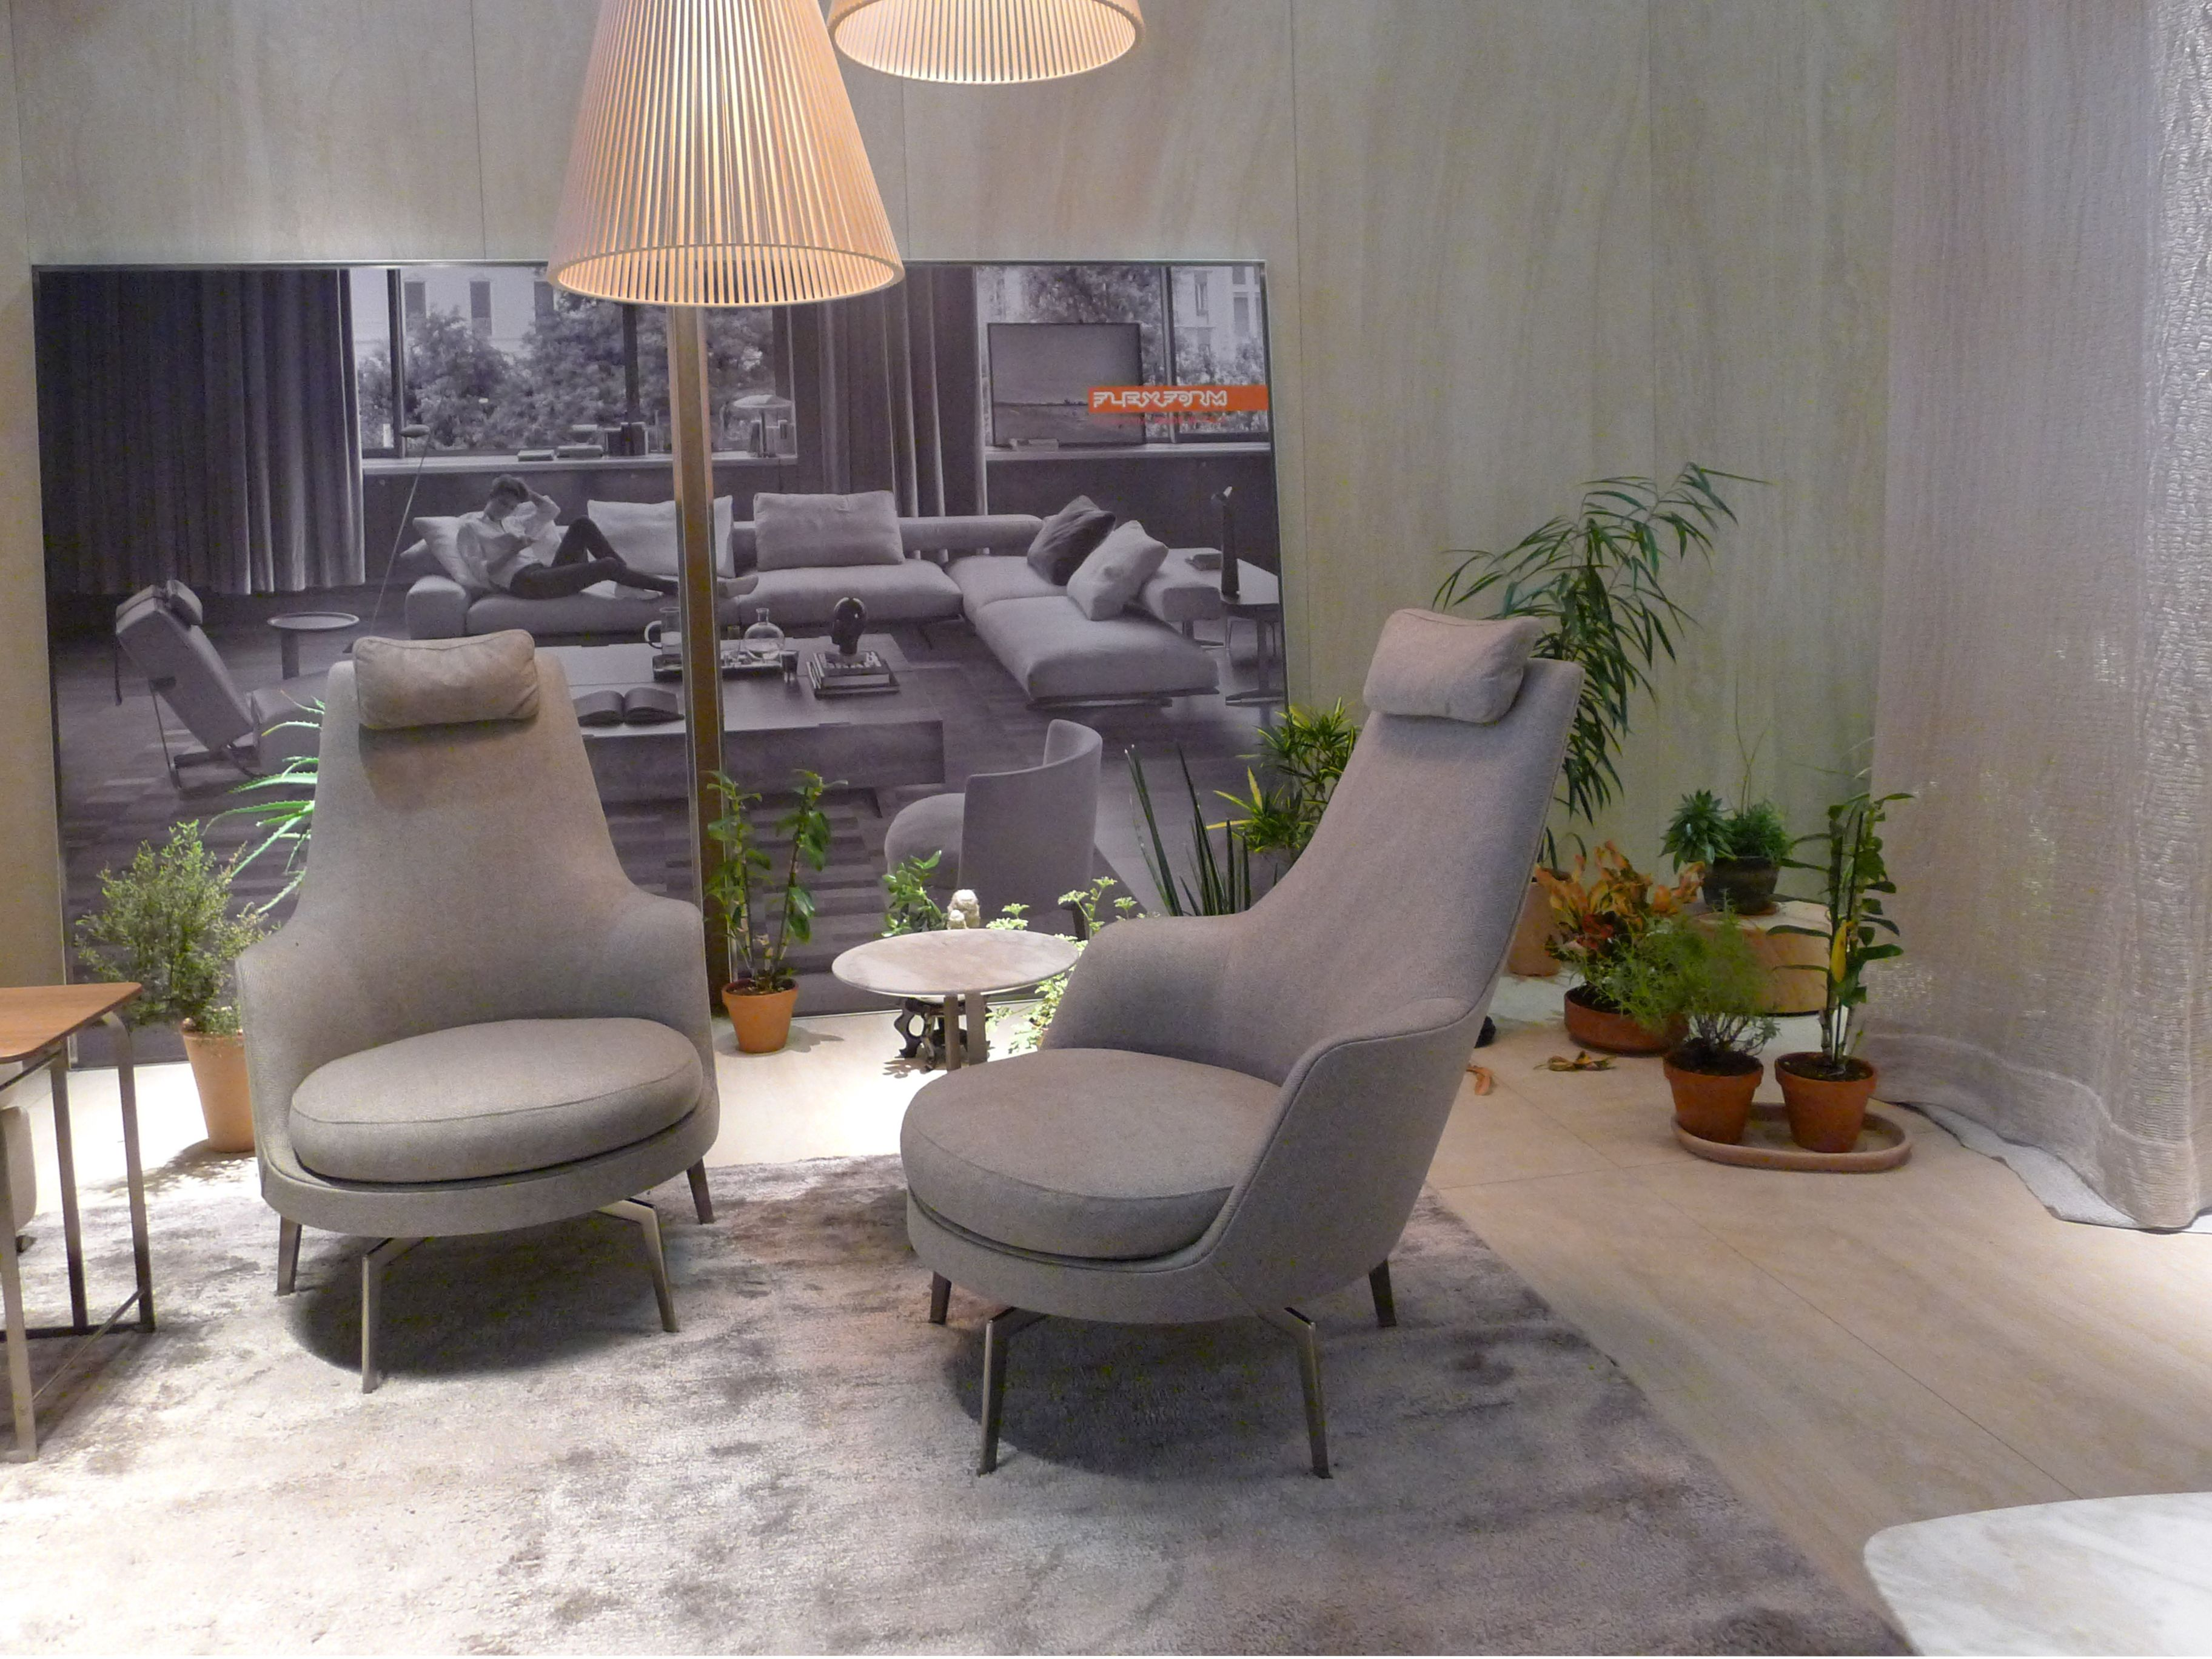 Wohnideen Luzern 2015 salonemobili myflexform guscioalto wohnidee luzern